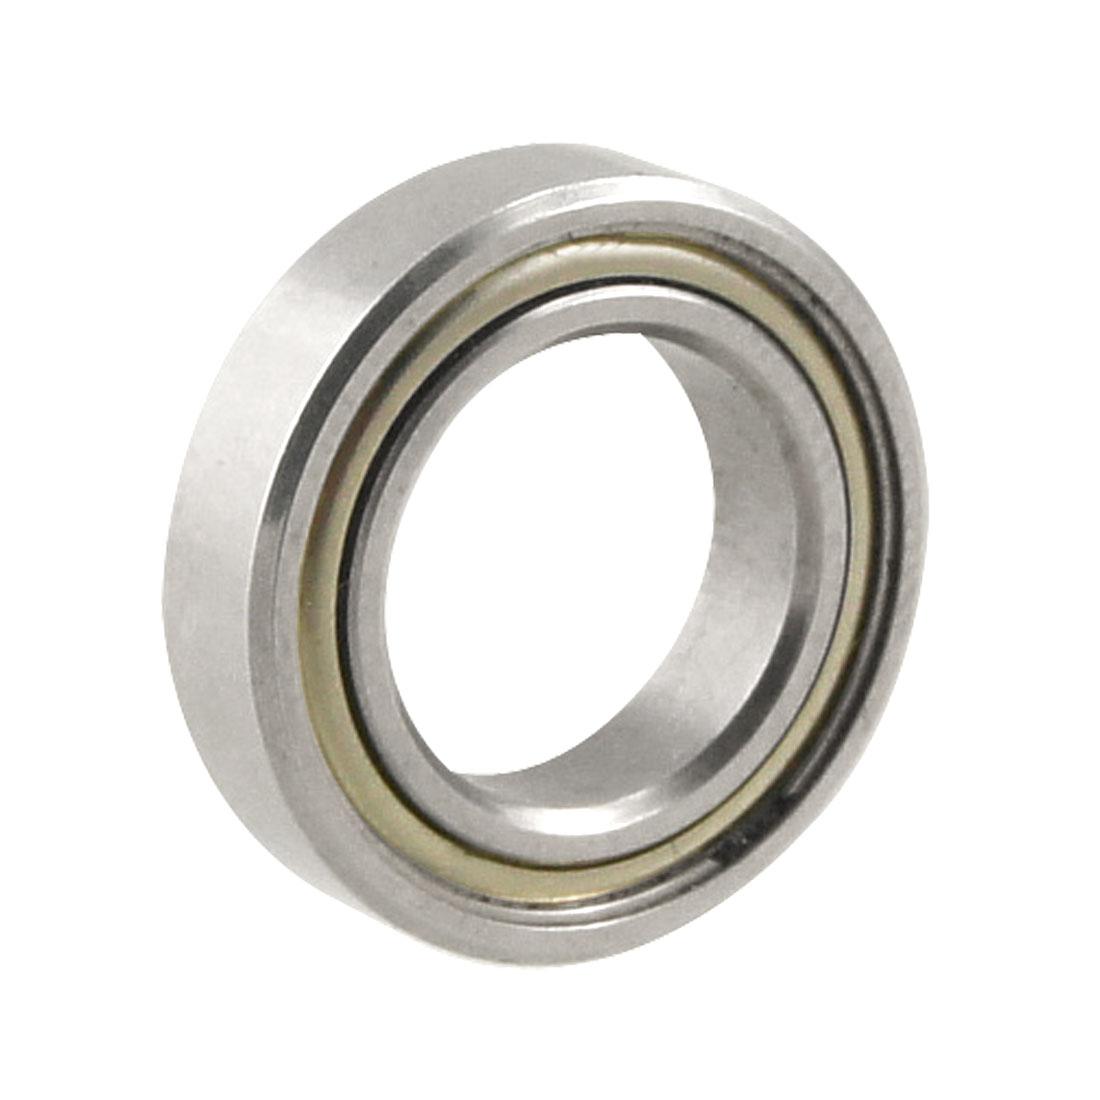 Silver Tone Metal 16mm x 9.5mm x 4mm Shield Ball Bearing